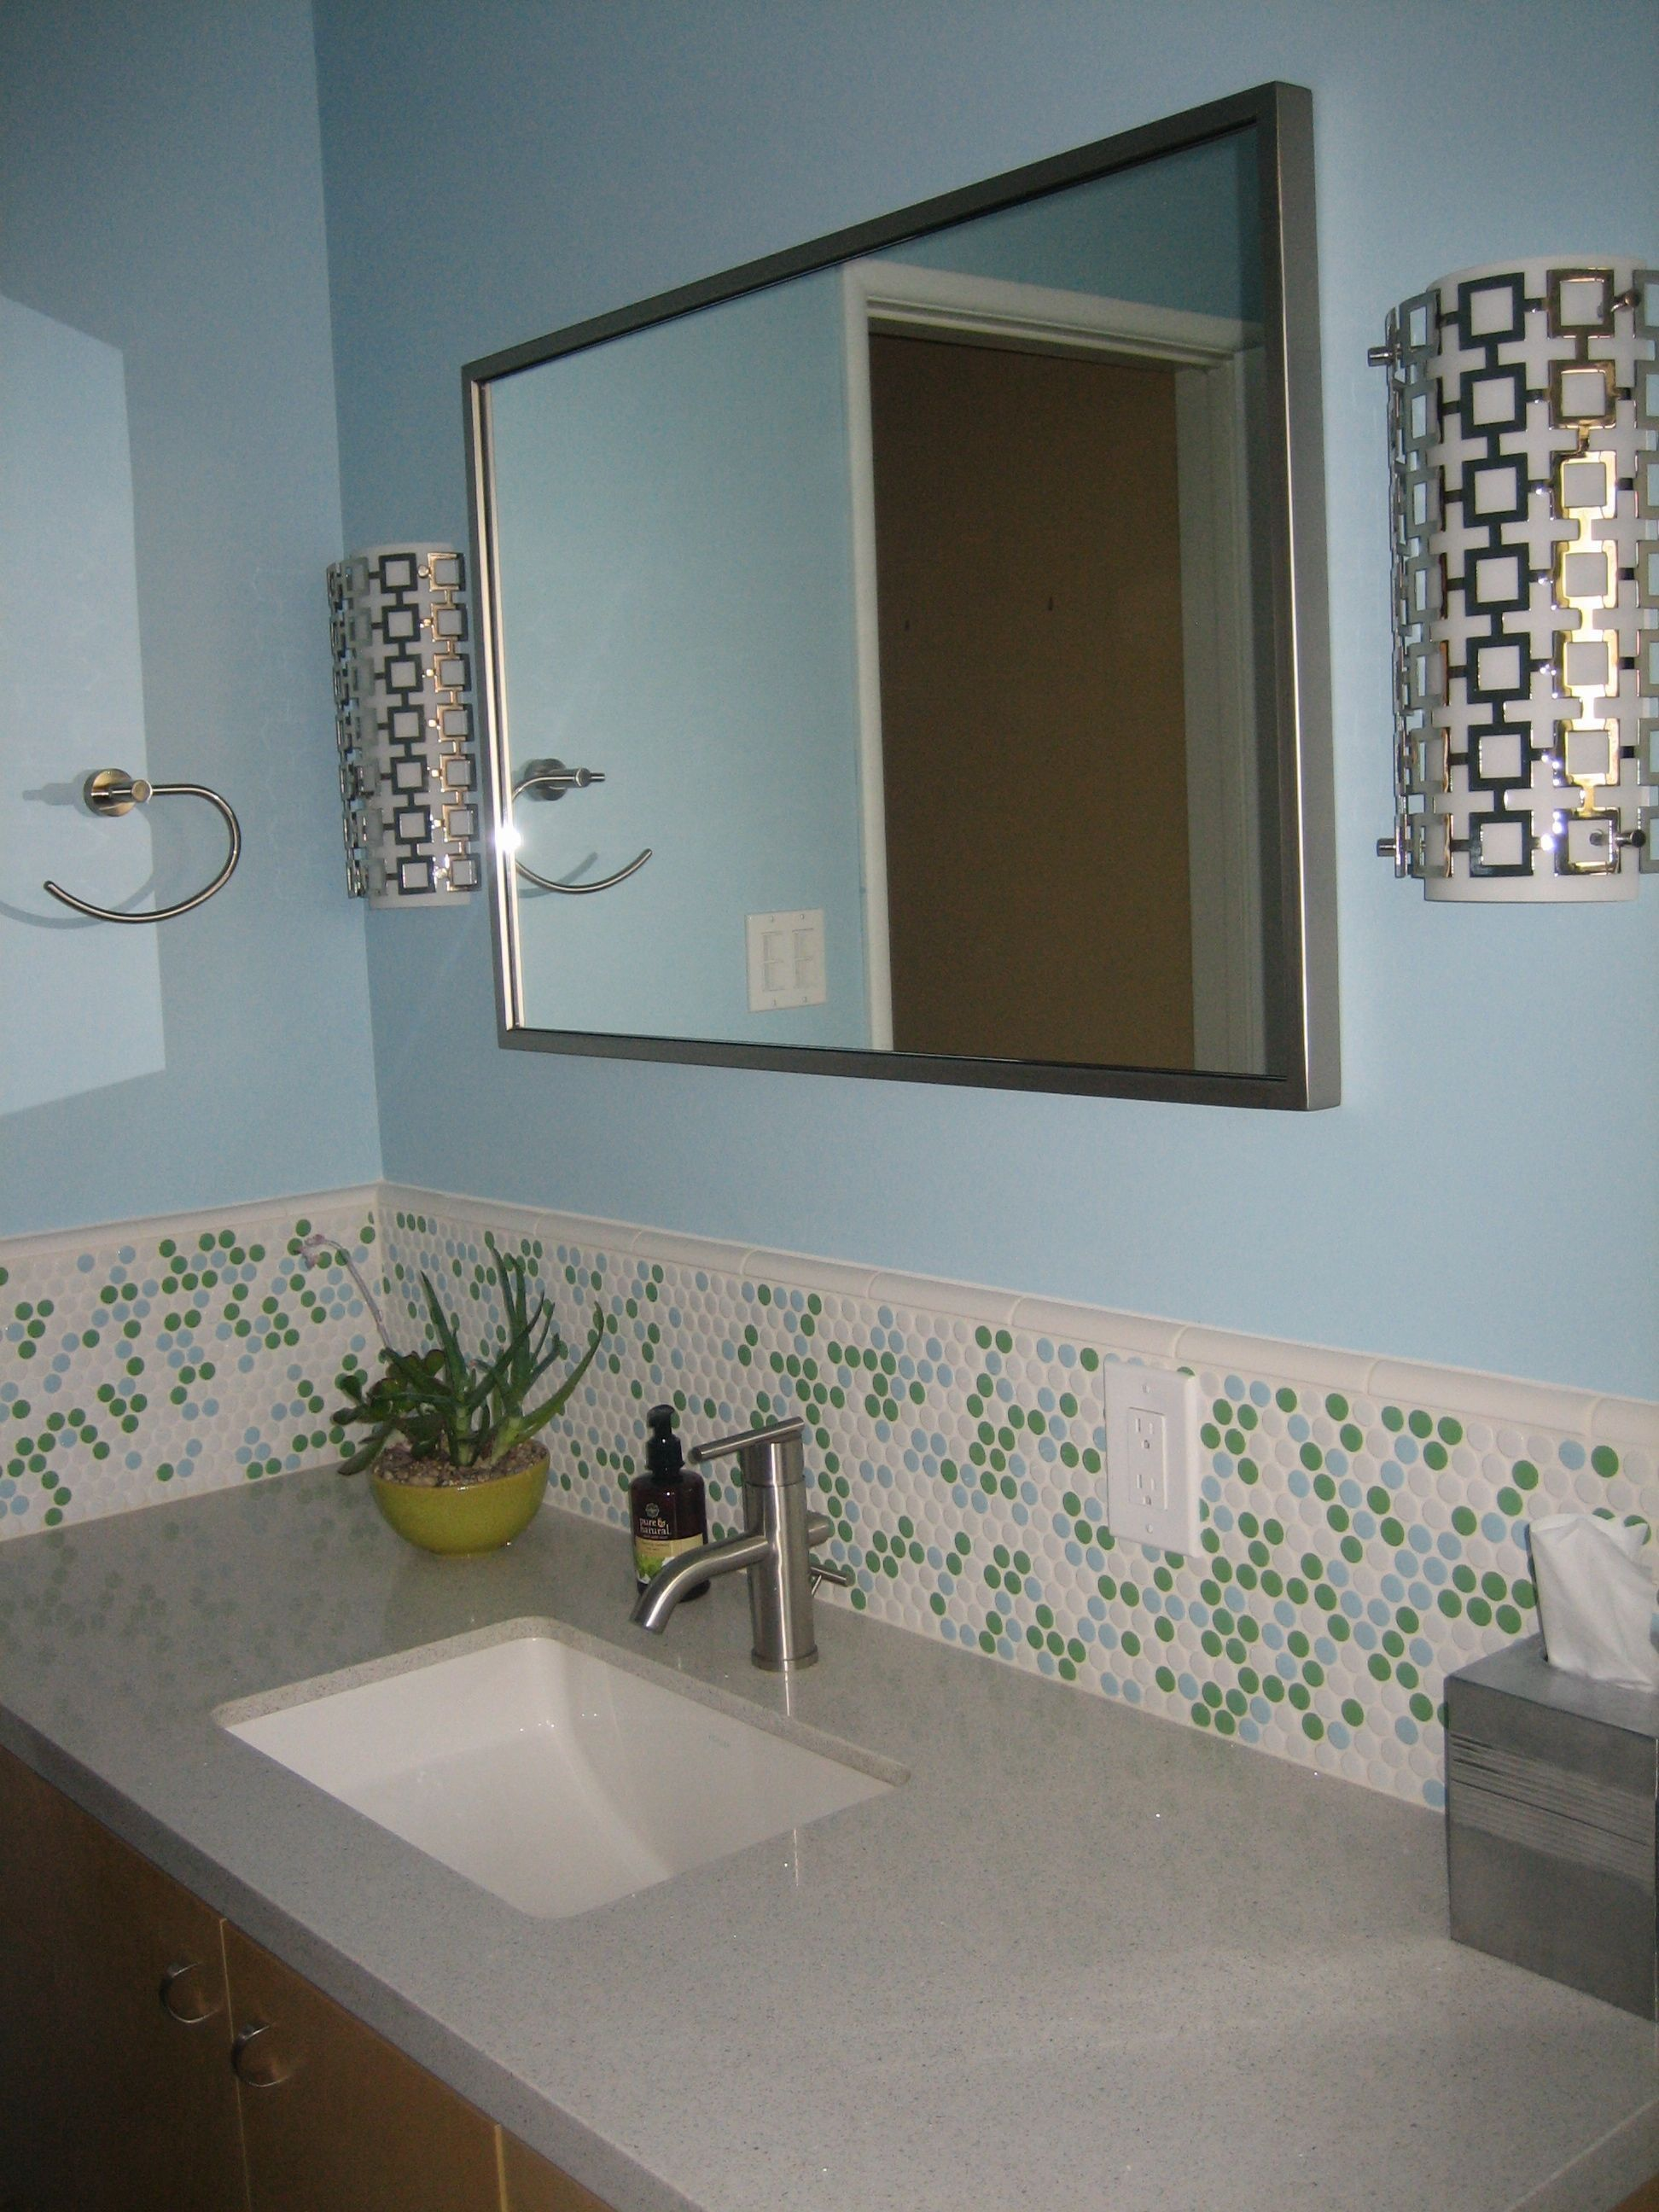 10 Small Glass Tiles In 2020 Glass Tiles Kitchen Kitchen Tiles